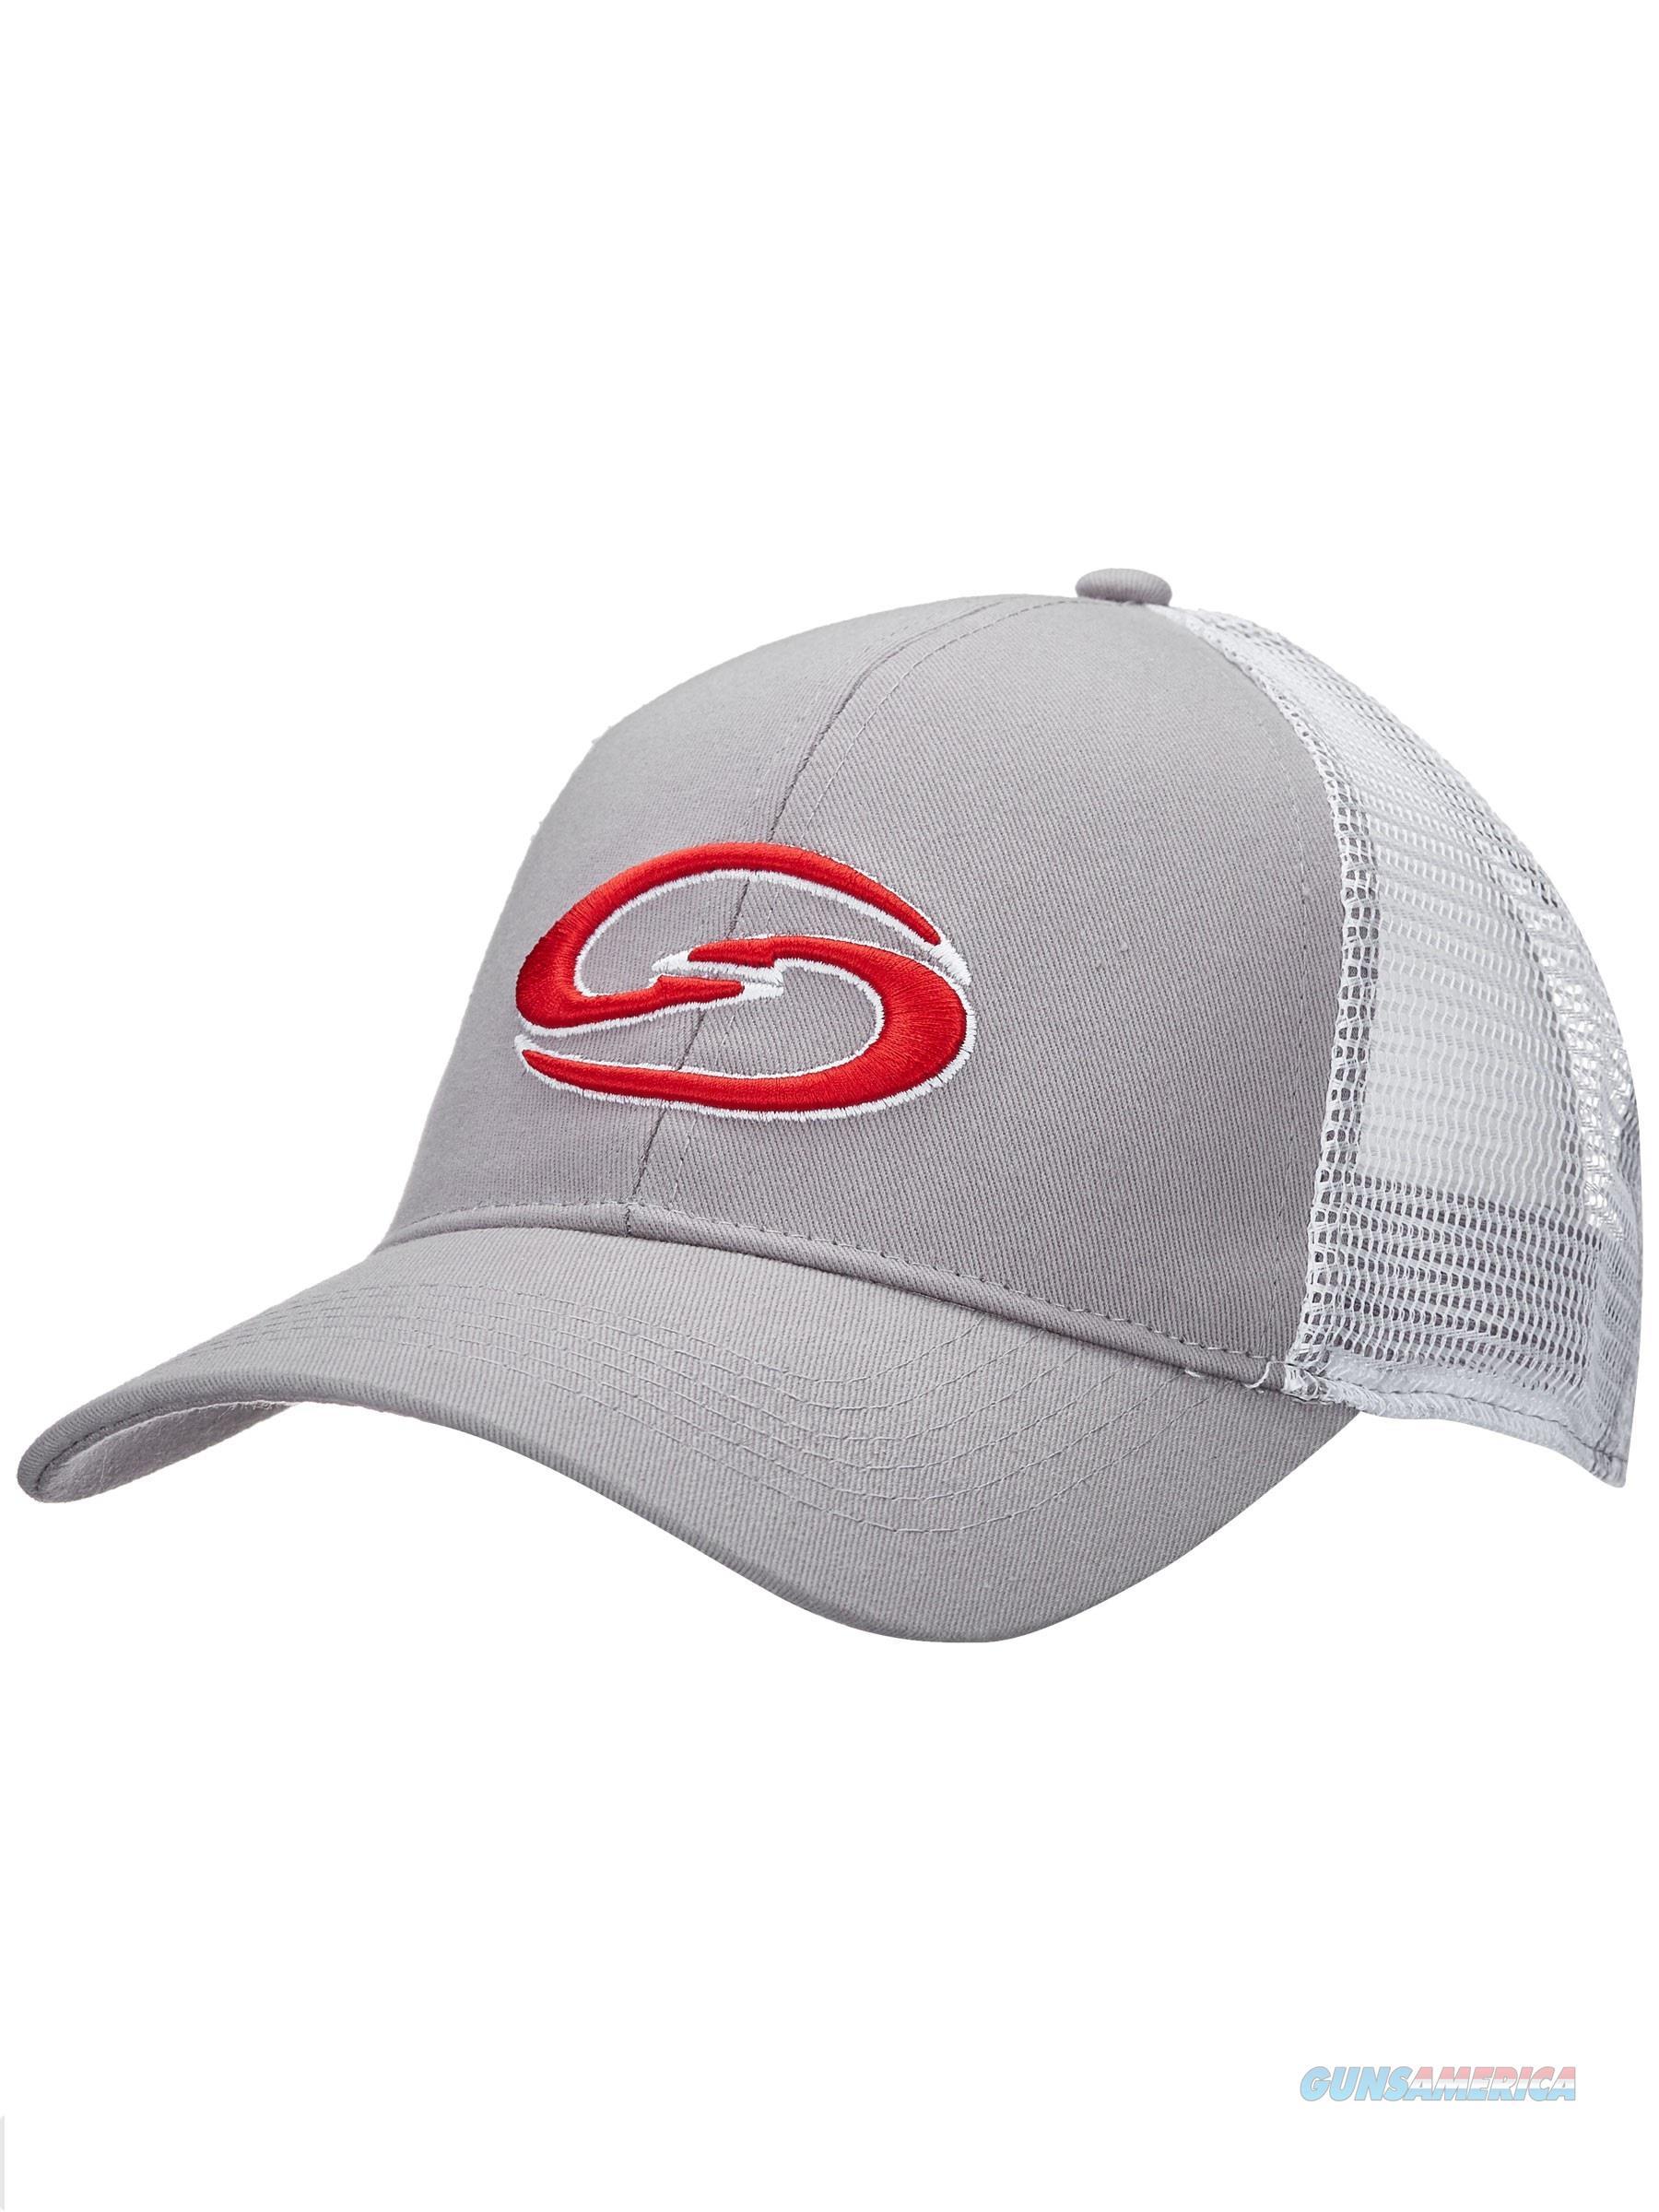 Strike King Trucker Cap Gray White  Non-Guns > Hunting Clothing and Equipment > Clothing > Hats